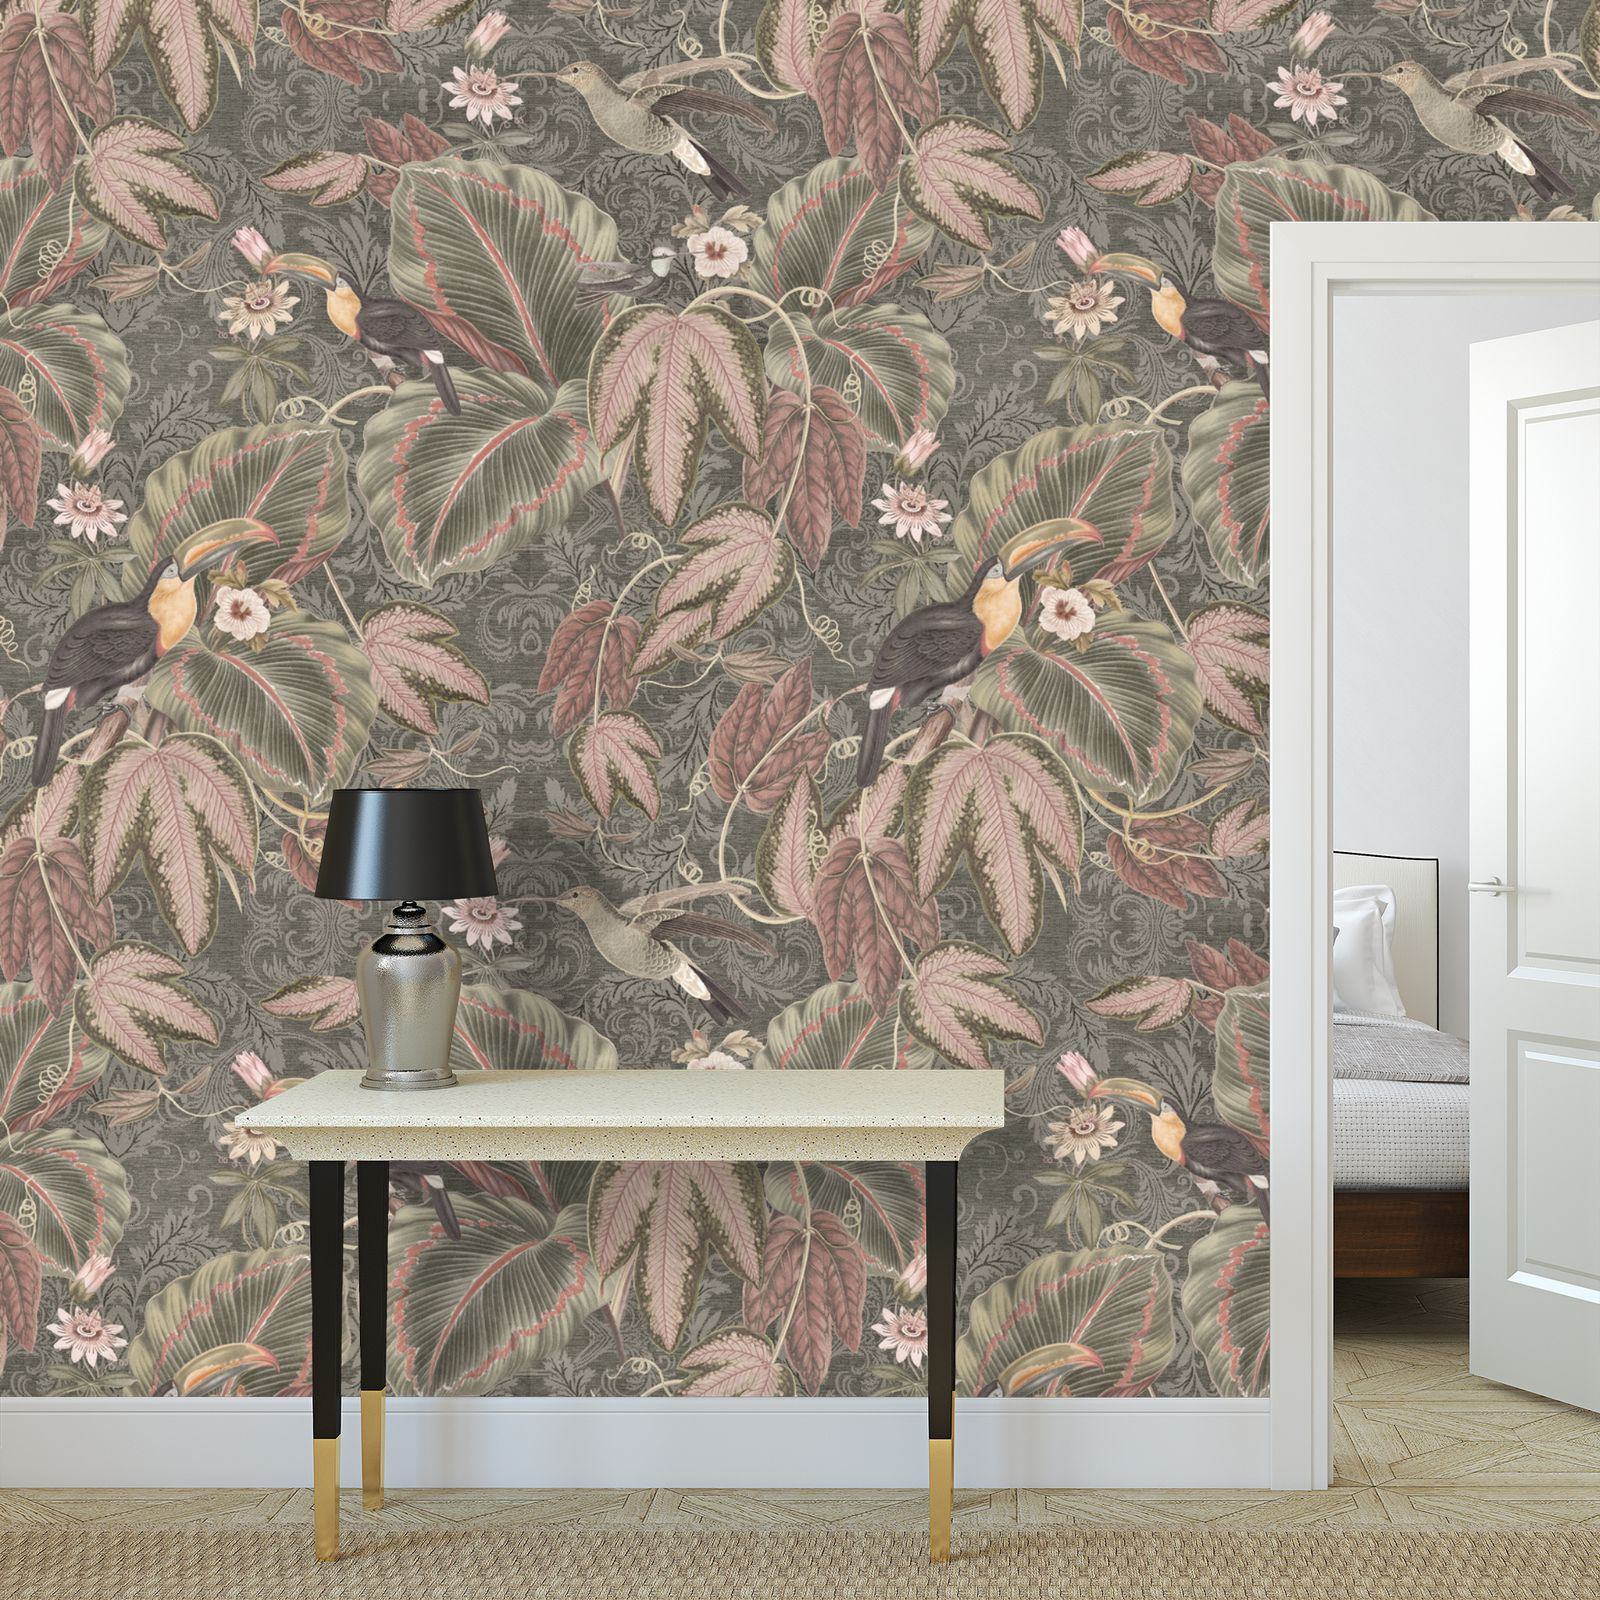 Premium printed wallpaper - Exotic birds foliage